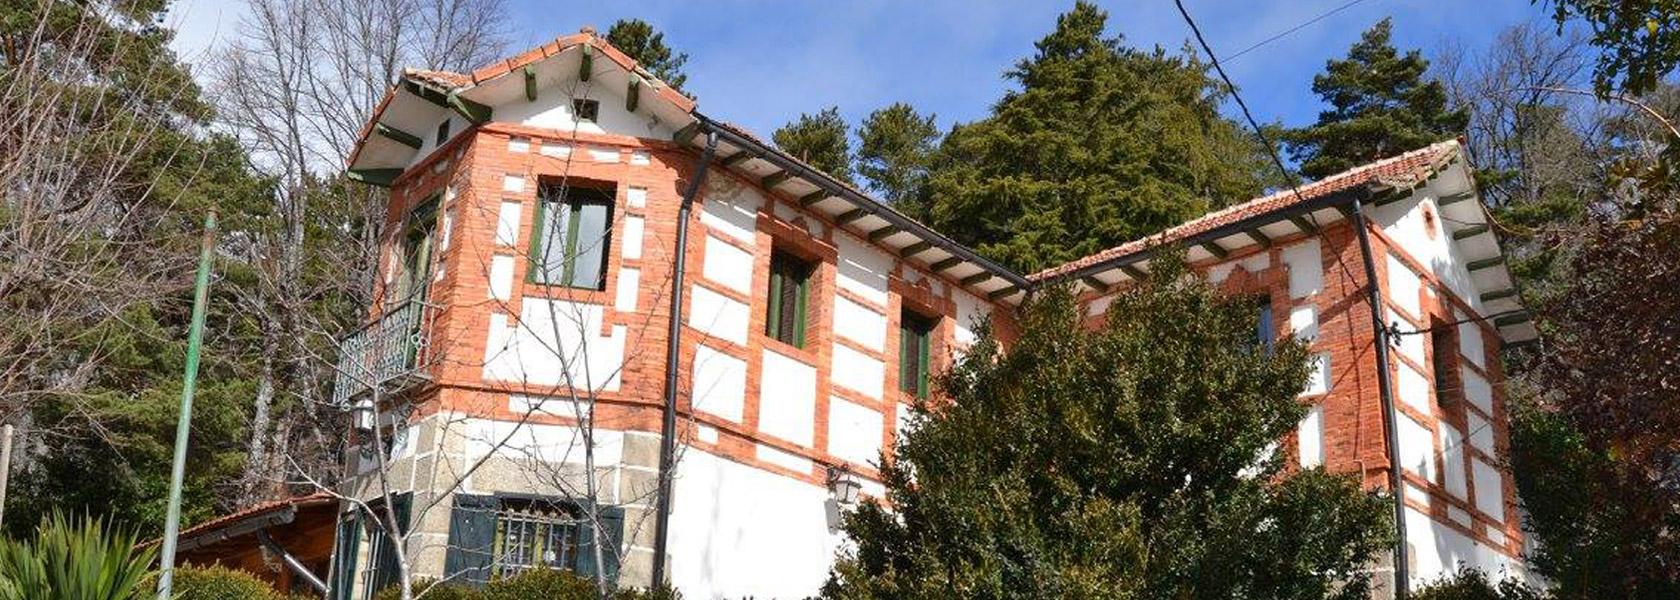 Casa Rural Sierra De Madrid - Diseños Arquitectónicos - Mimasku.com